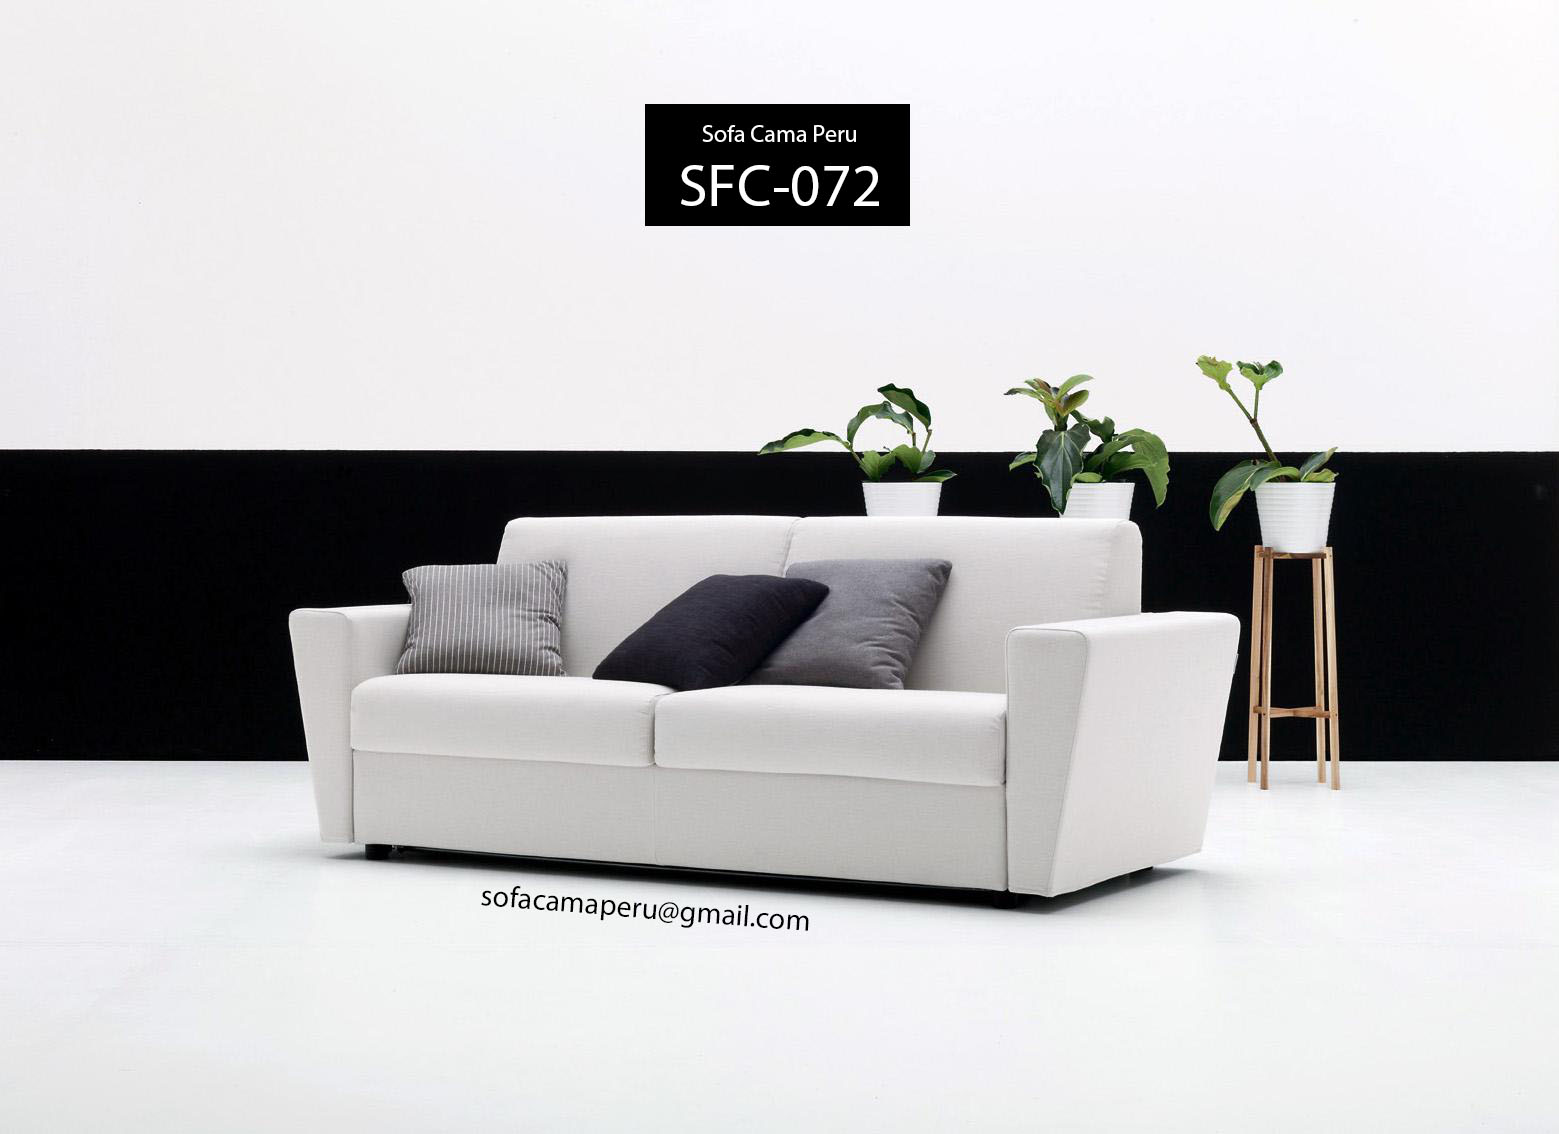 Sofa Cama Peru Octubre 2016 # Muebles Ferrini